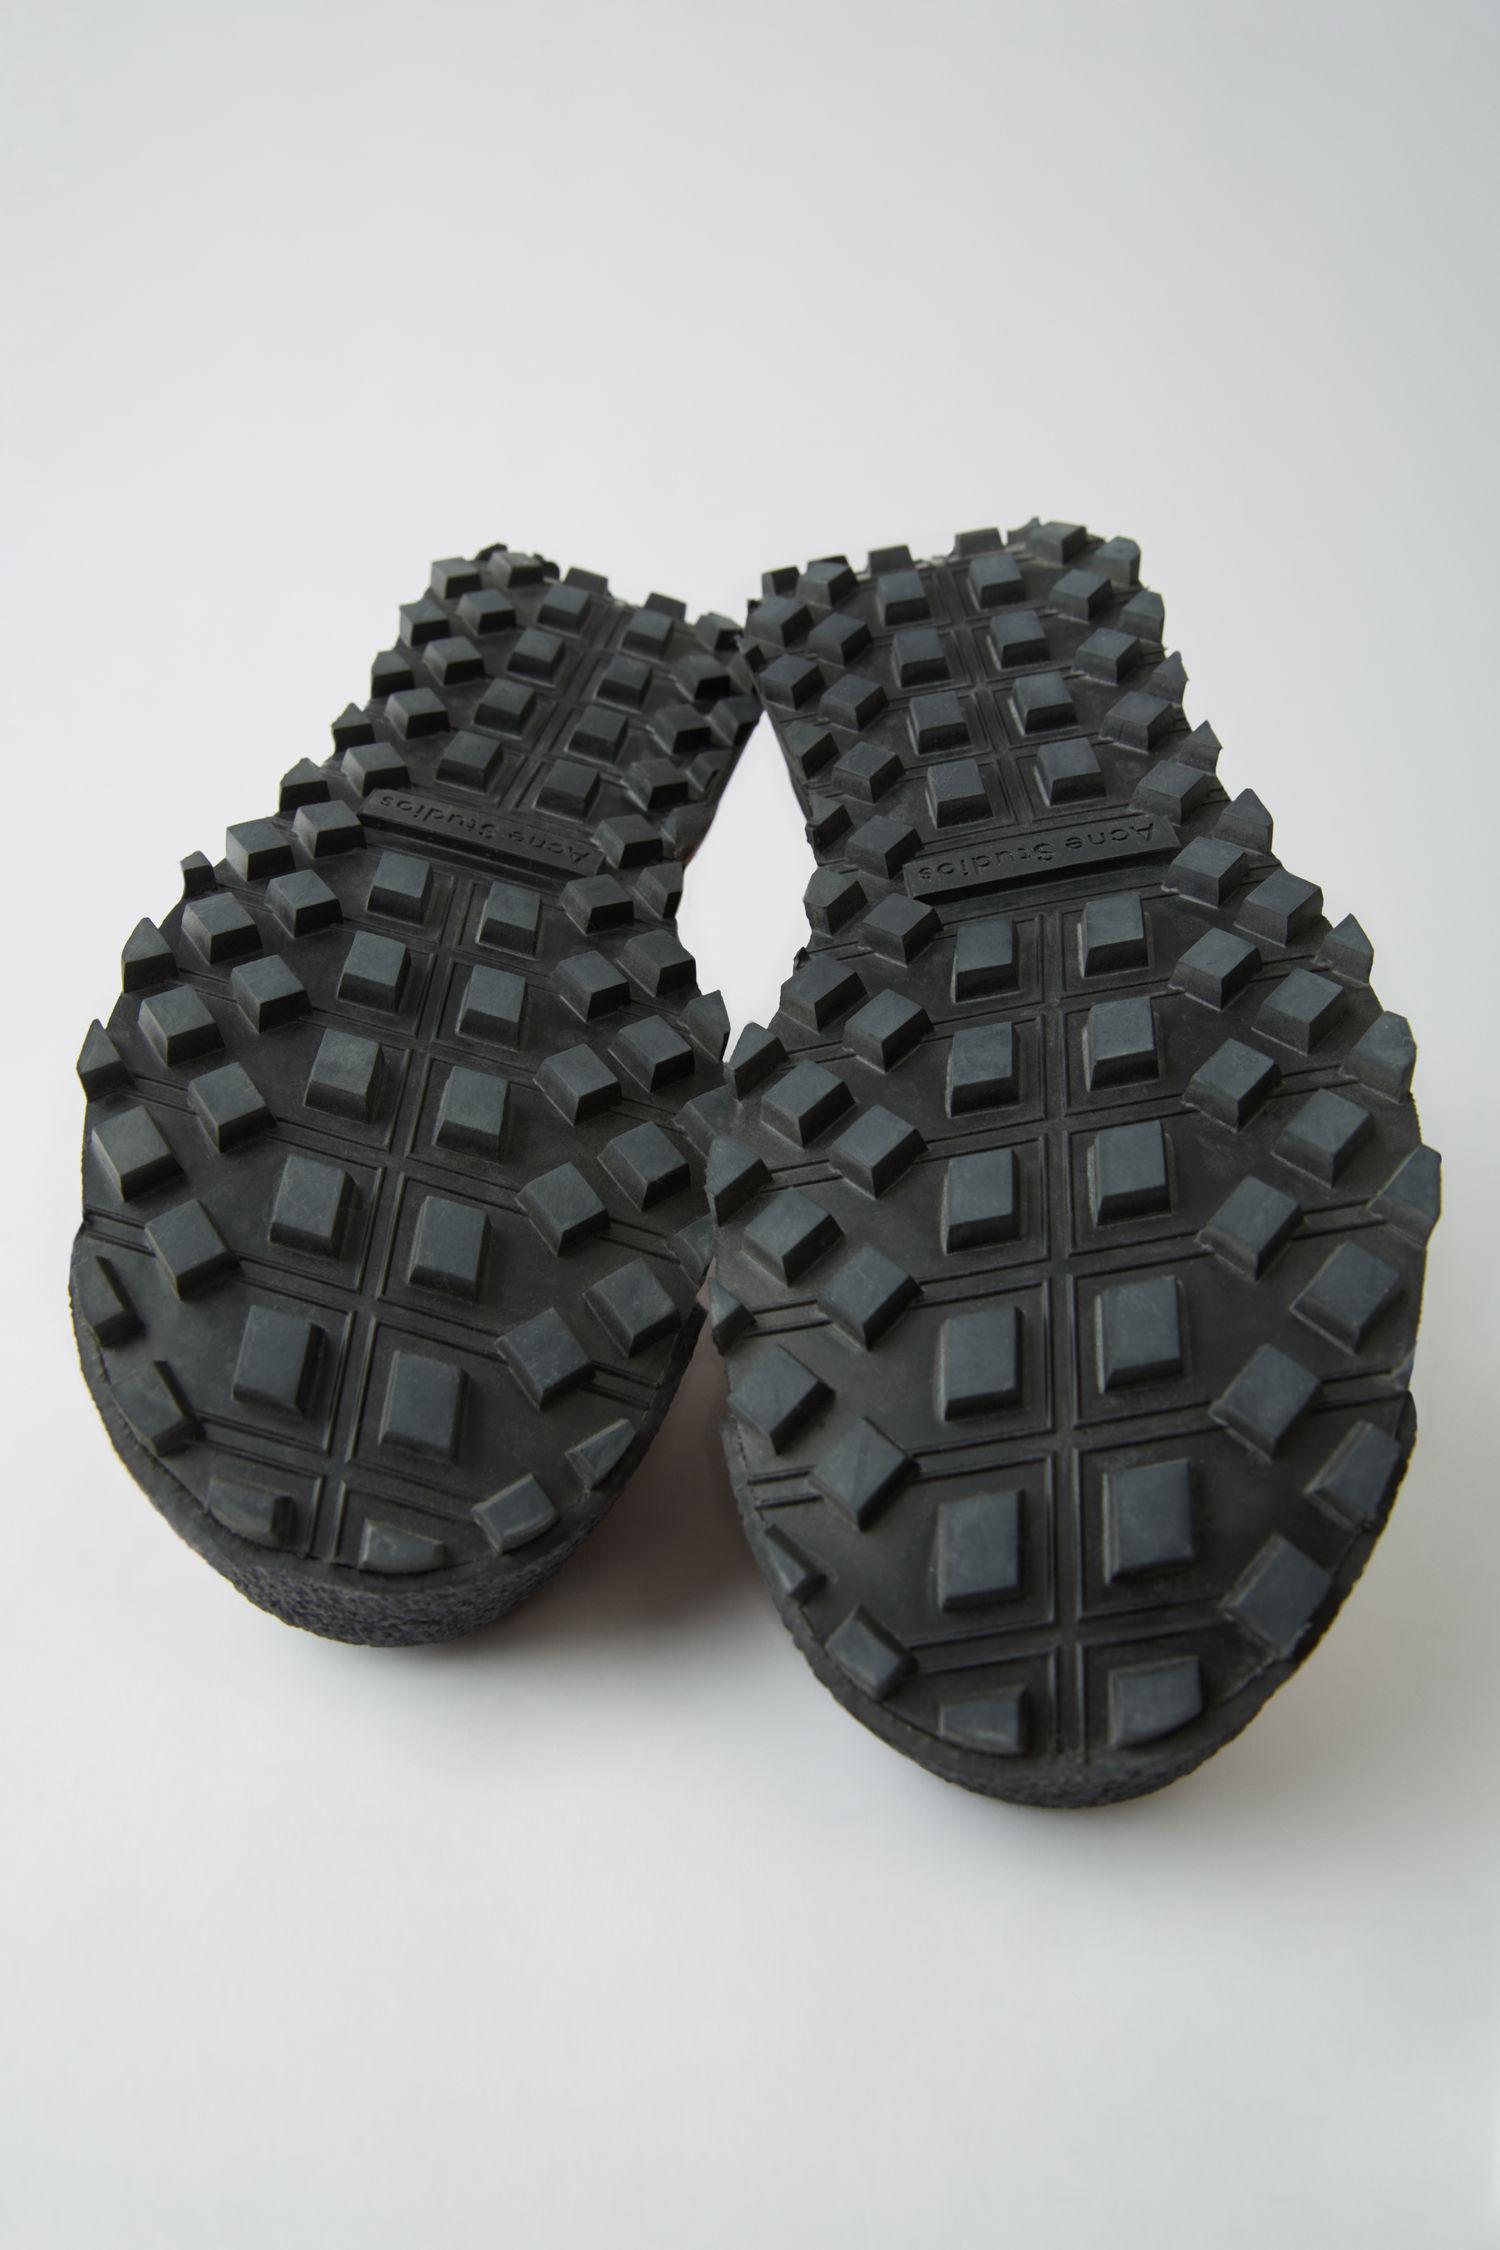 acne_studios_trekking_boots_multi_green_2.jpg